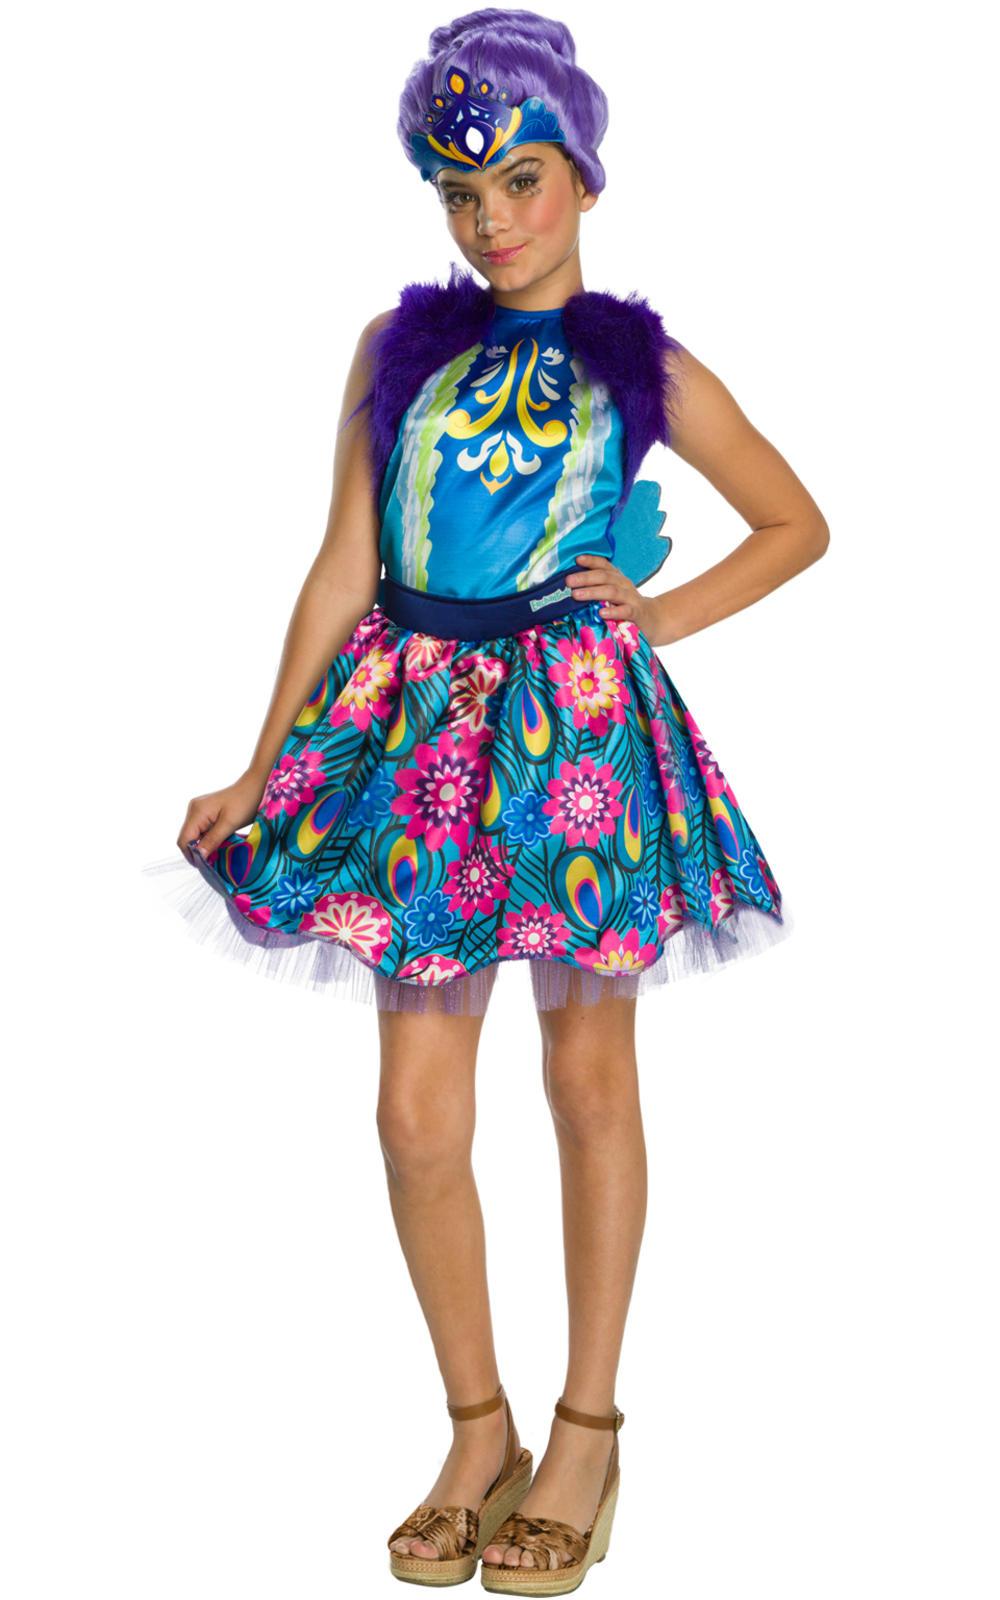 Patter Peacock Girls Fancy Dress Enchantimals Animal Kids Fairy Tale Costume New